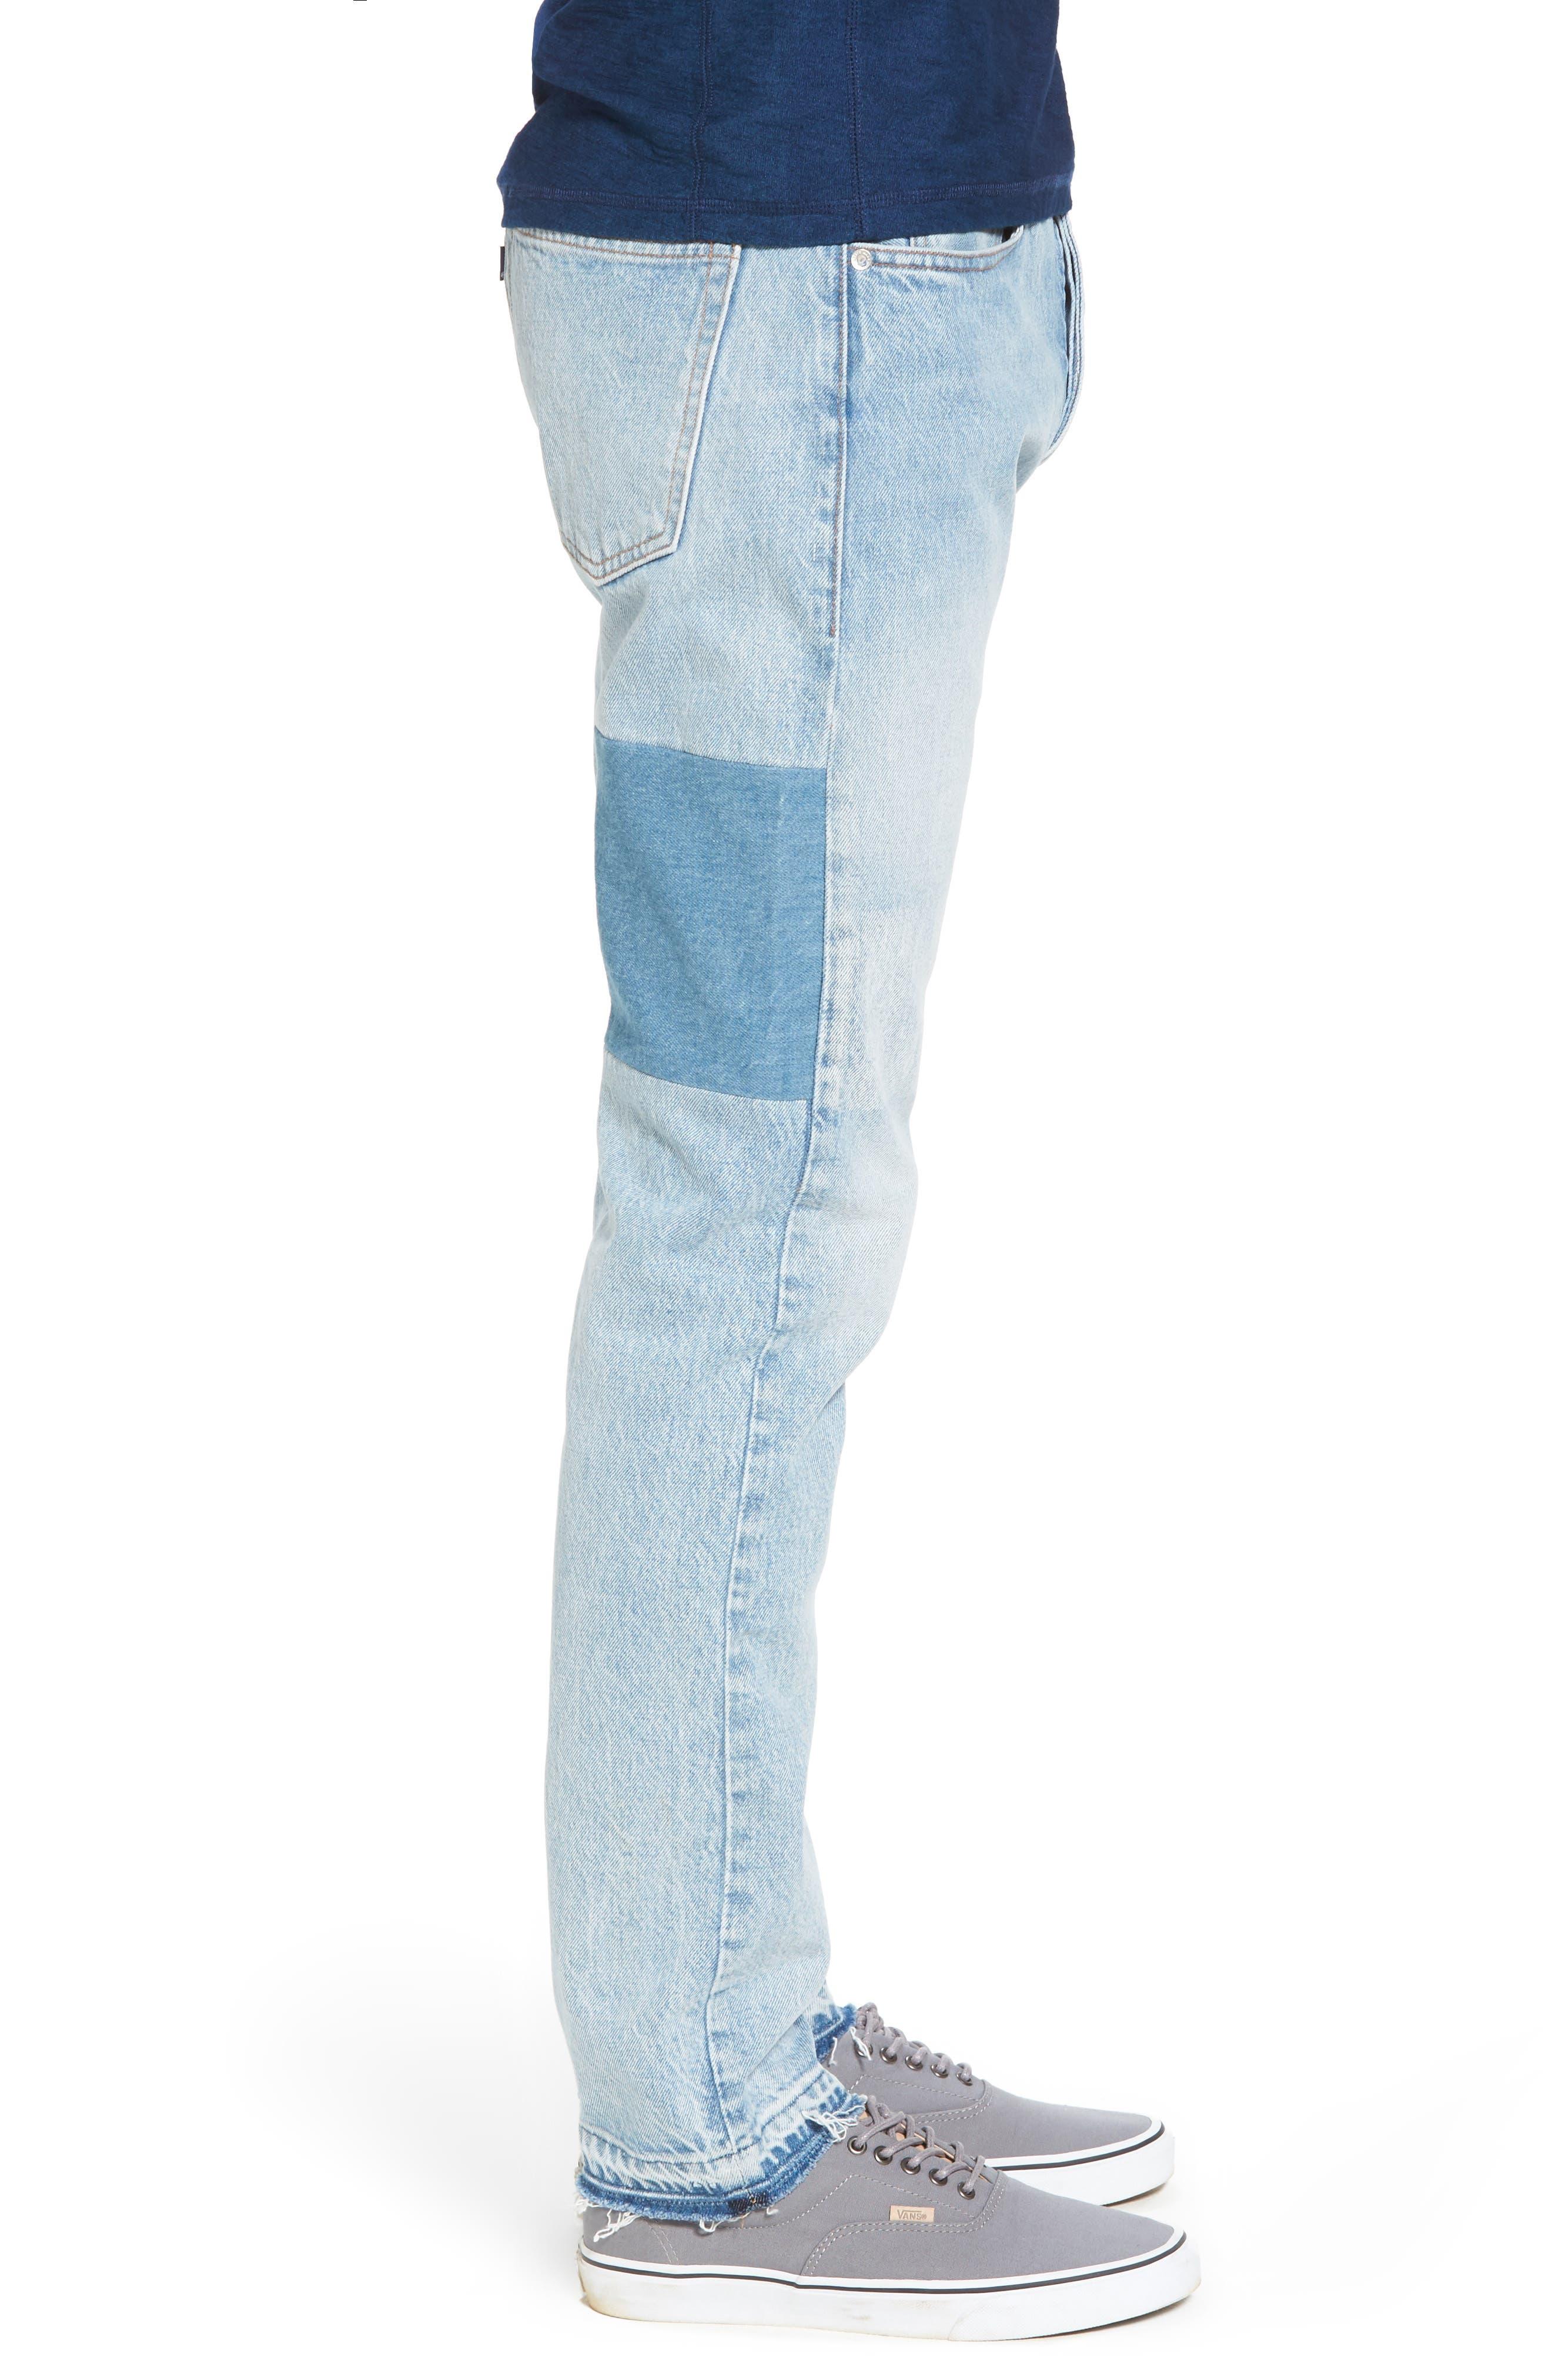 Studio Slim Fit Jeans,                             Alternate thumbnail 3, color,